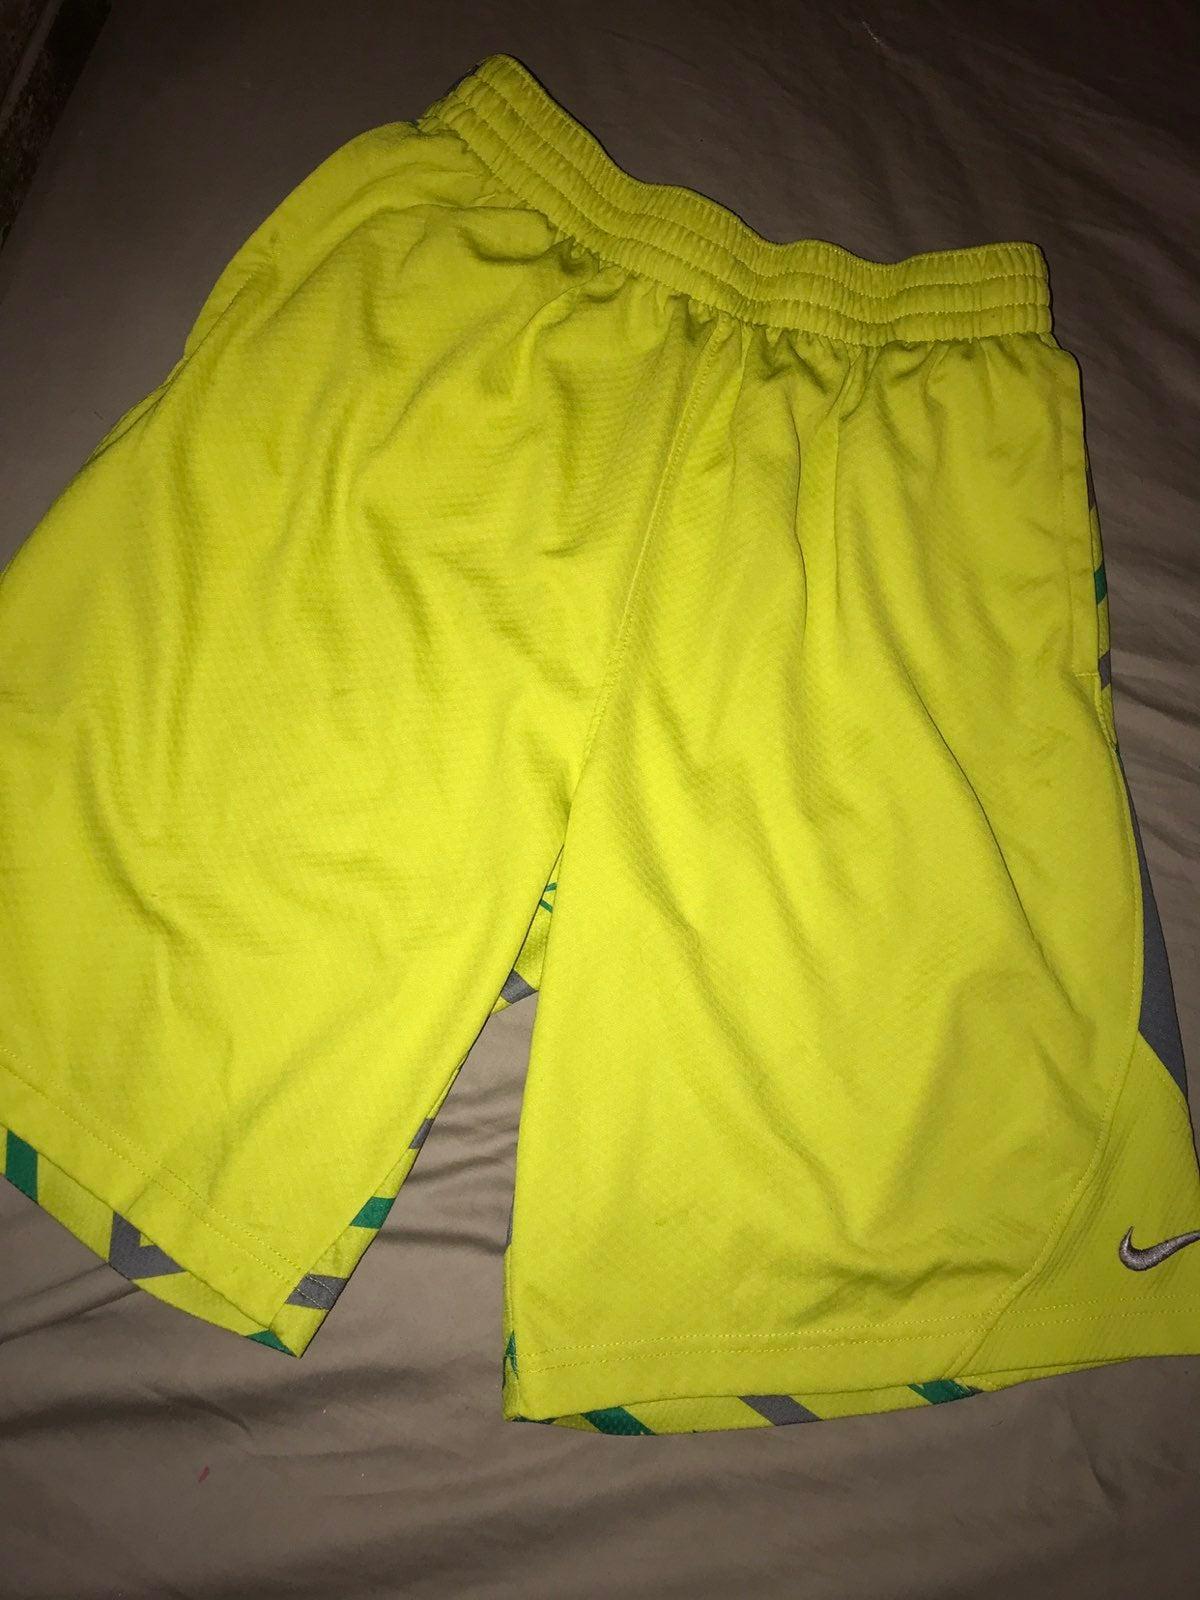 Vintage Nike Yellow Volt Short